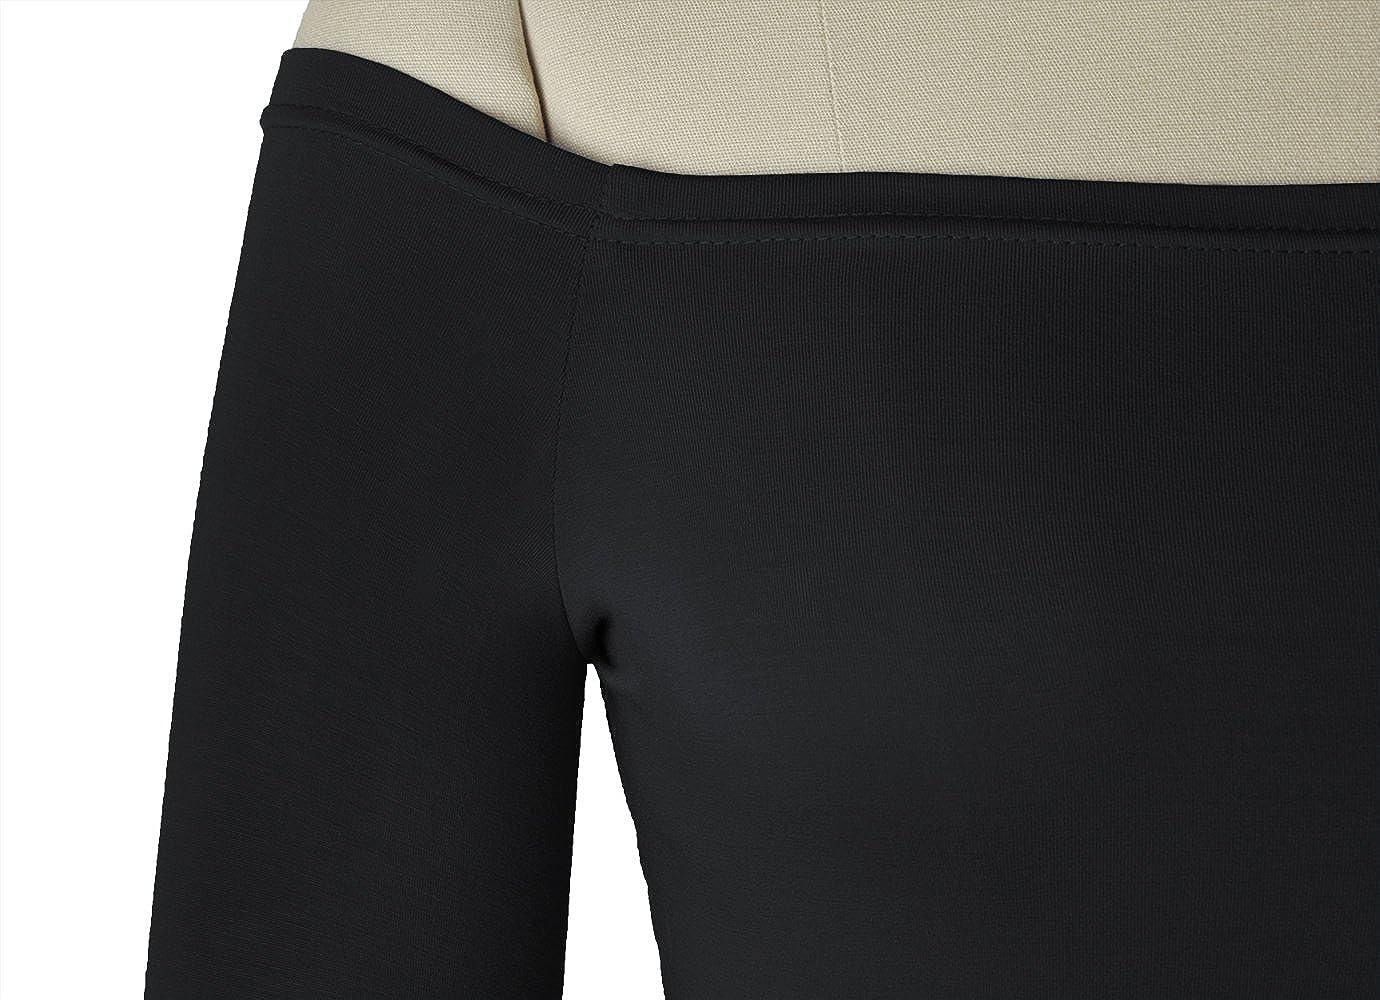 Amazon.com: Camisa tipo blusa manga larga informal, con ...